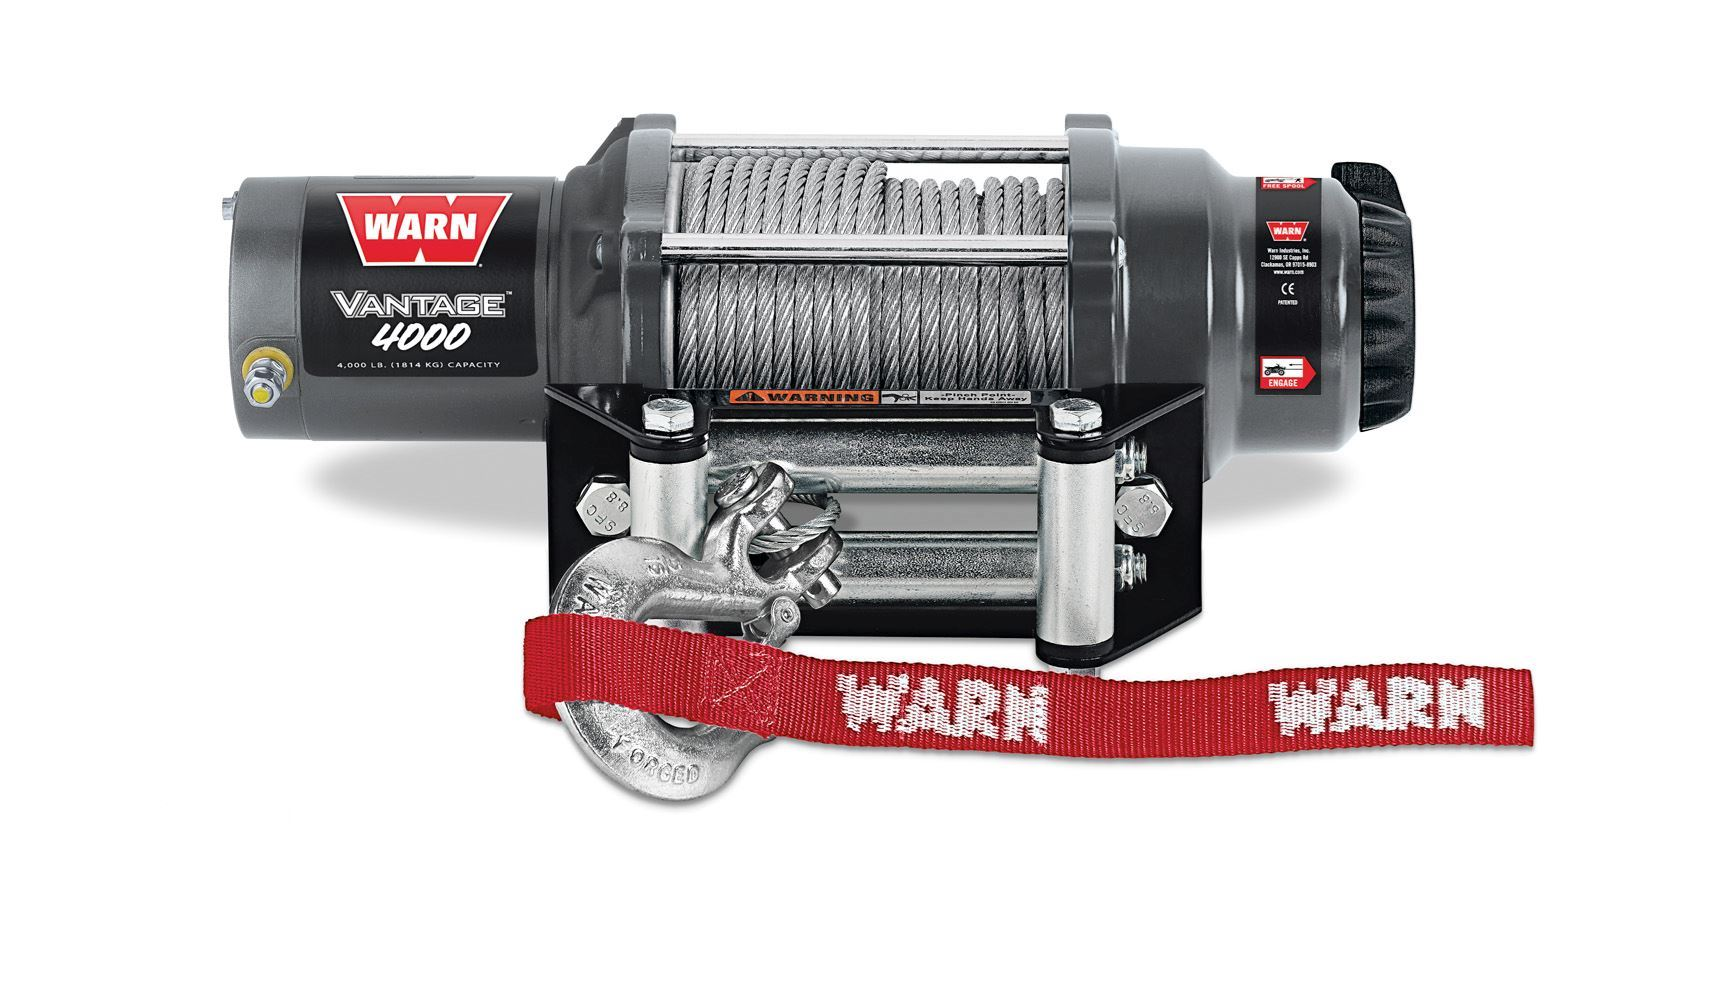 hight resolution of vantage 4000 winch warn industries go prepared rh warn com warn winch 9000 wiring diagram warn a2000 winch wiring diagram